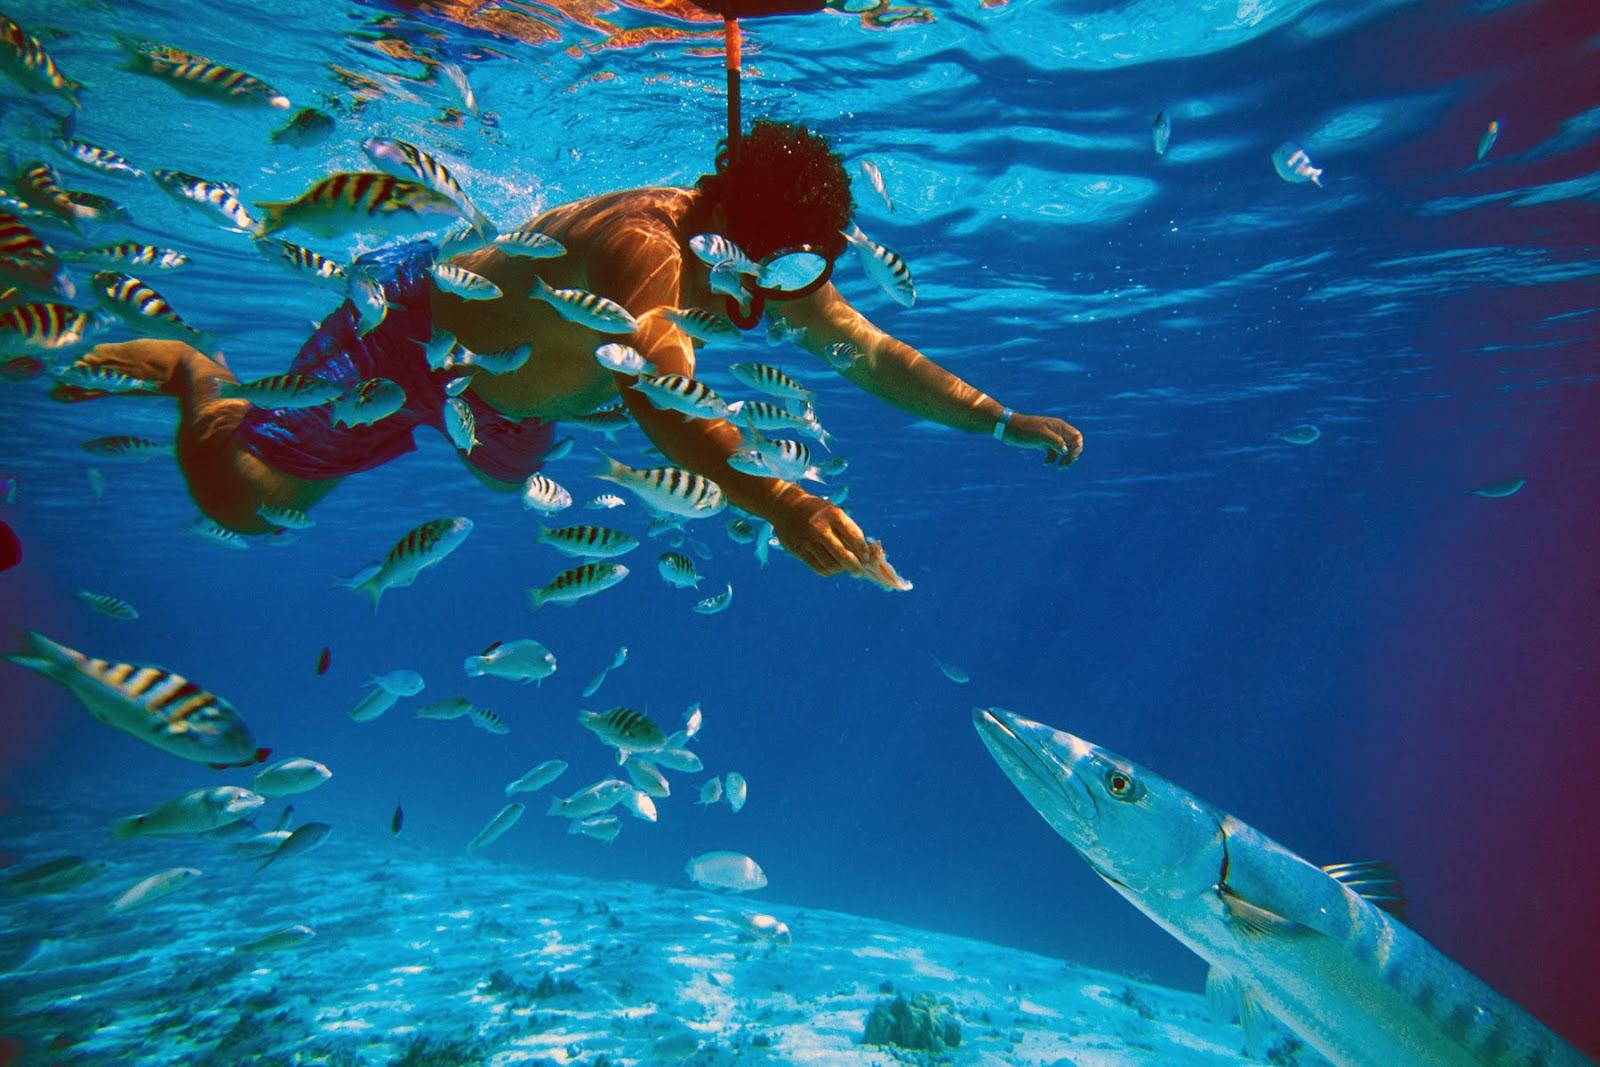 Tetiaroa, holiday in tahiti, vacation in Bora Bora, Moorea holiday, Brando resort, garden of eden, surfing, trekking, diving, Plage de Toaroto, honeymoon in Moorea, Mutiny on the Bounty,